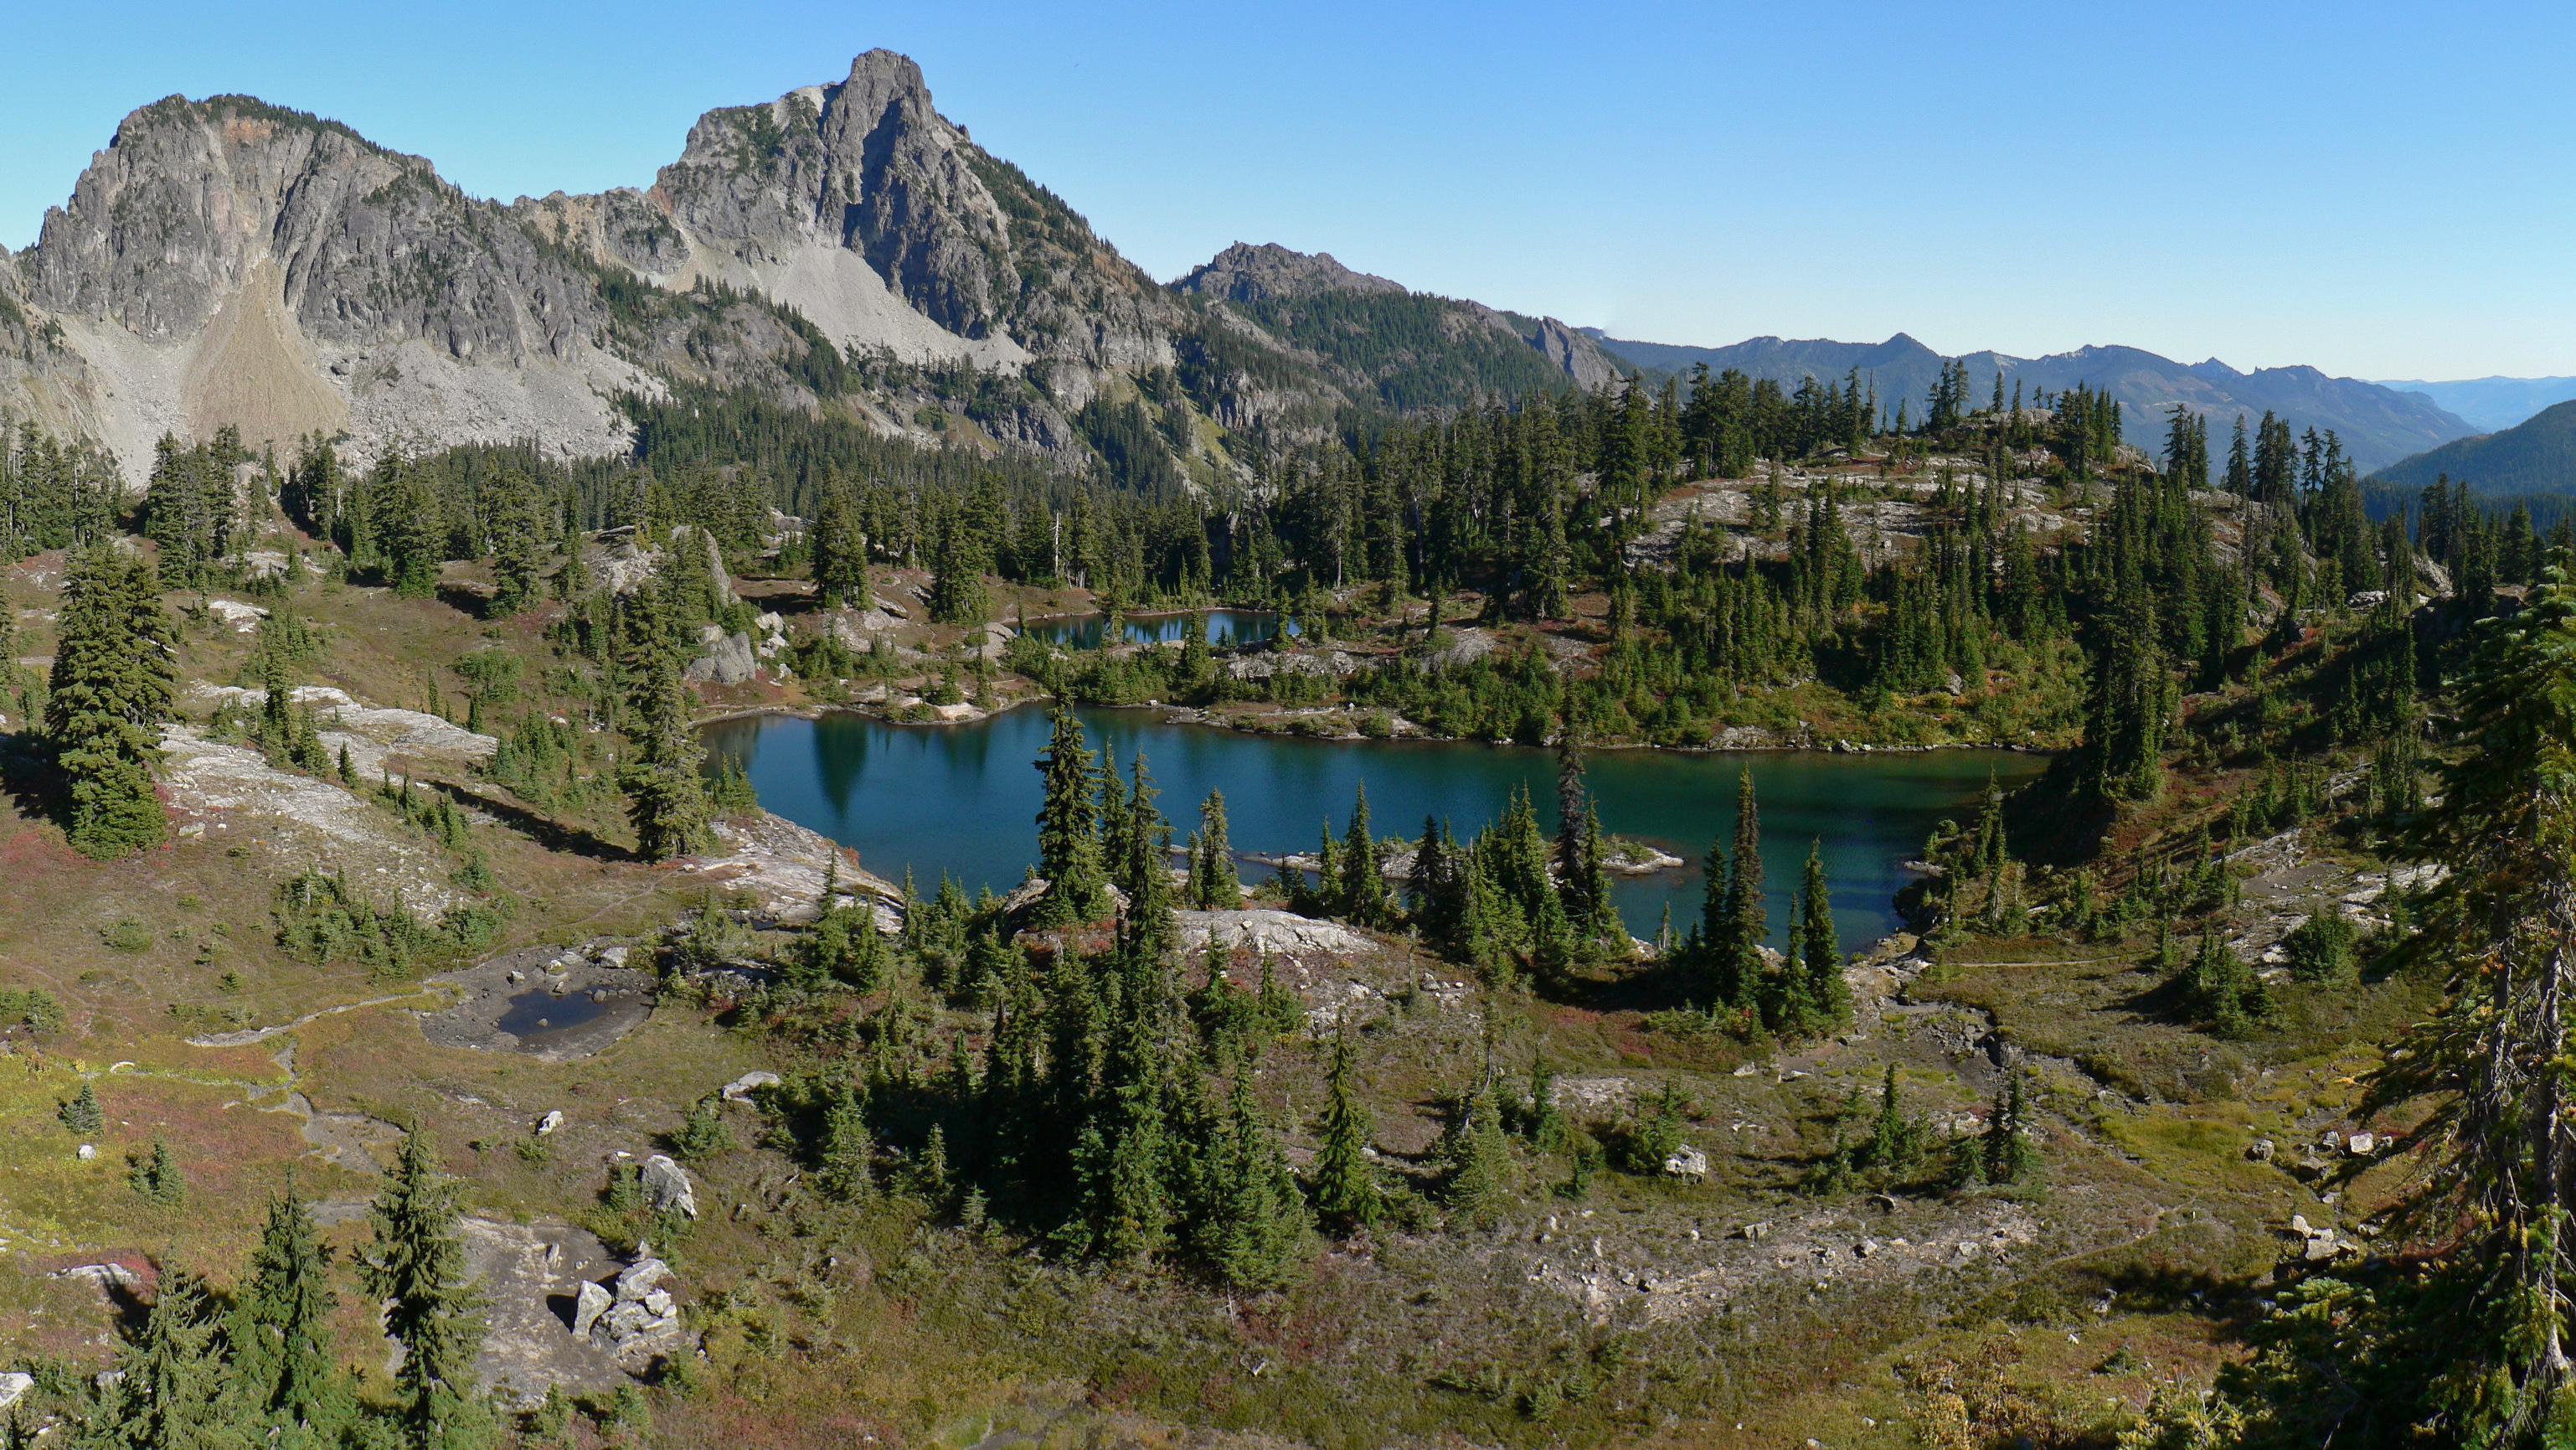 Enchanted Adventure Alpine Lakes Wilderness 38 Pics